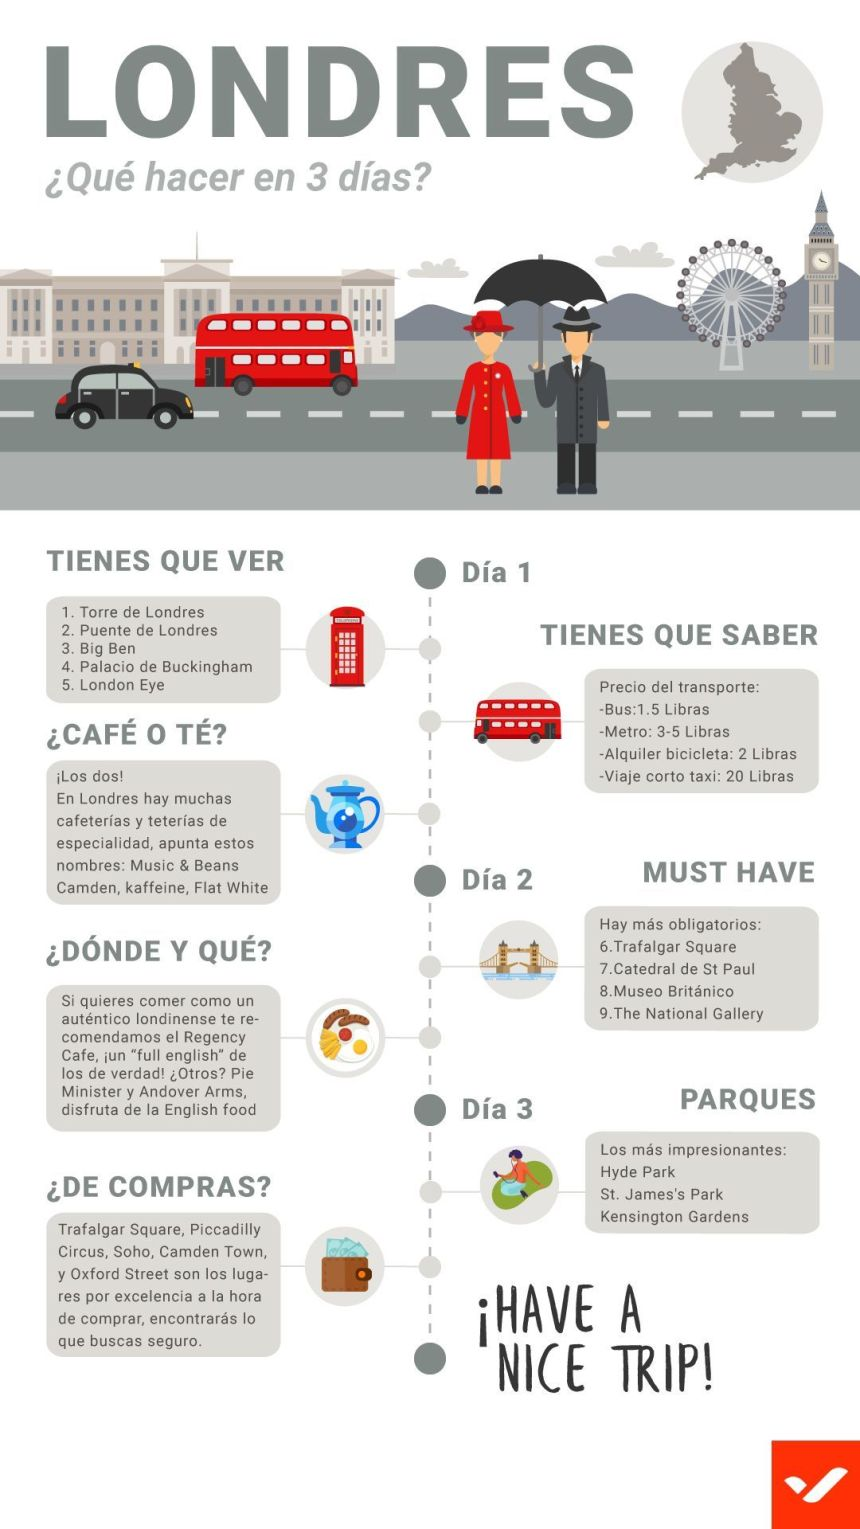 Londres: qué hacer en 3 días #infografia #infographic #turismo